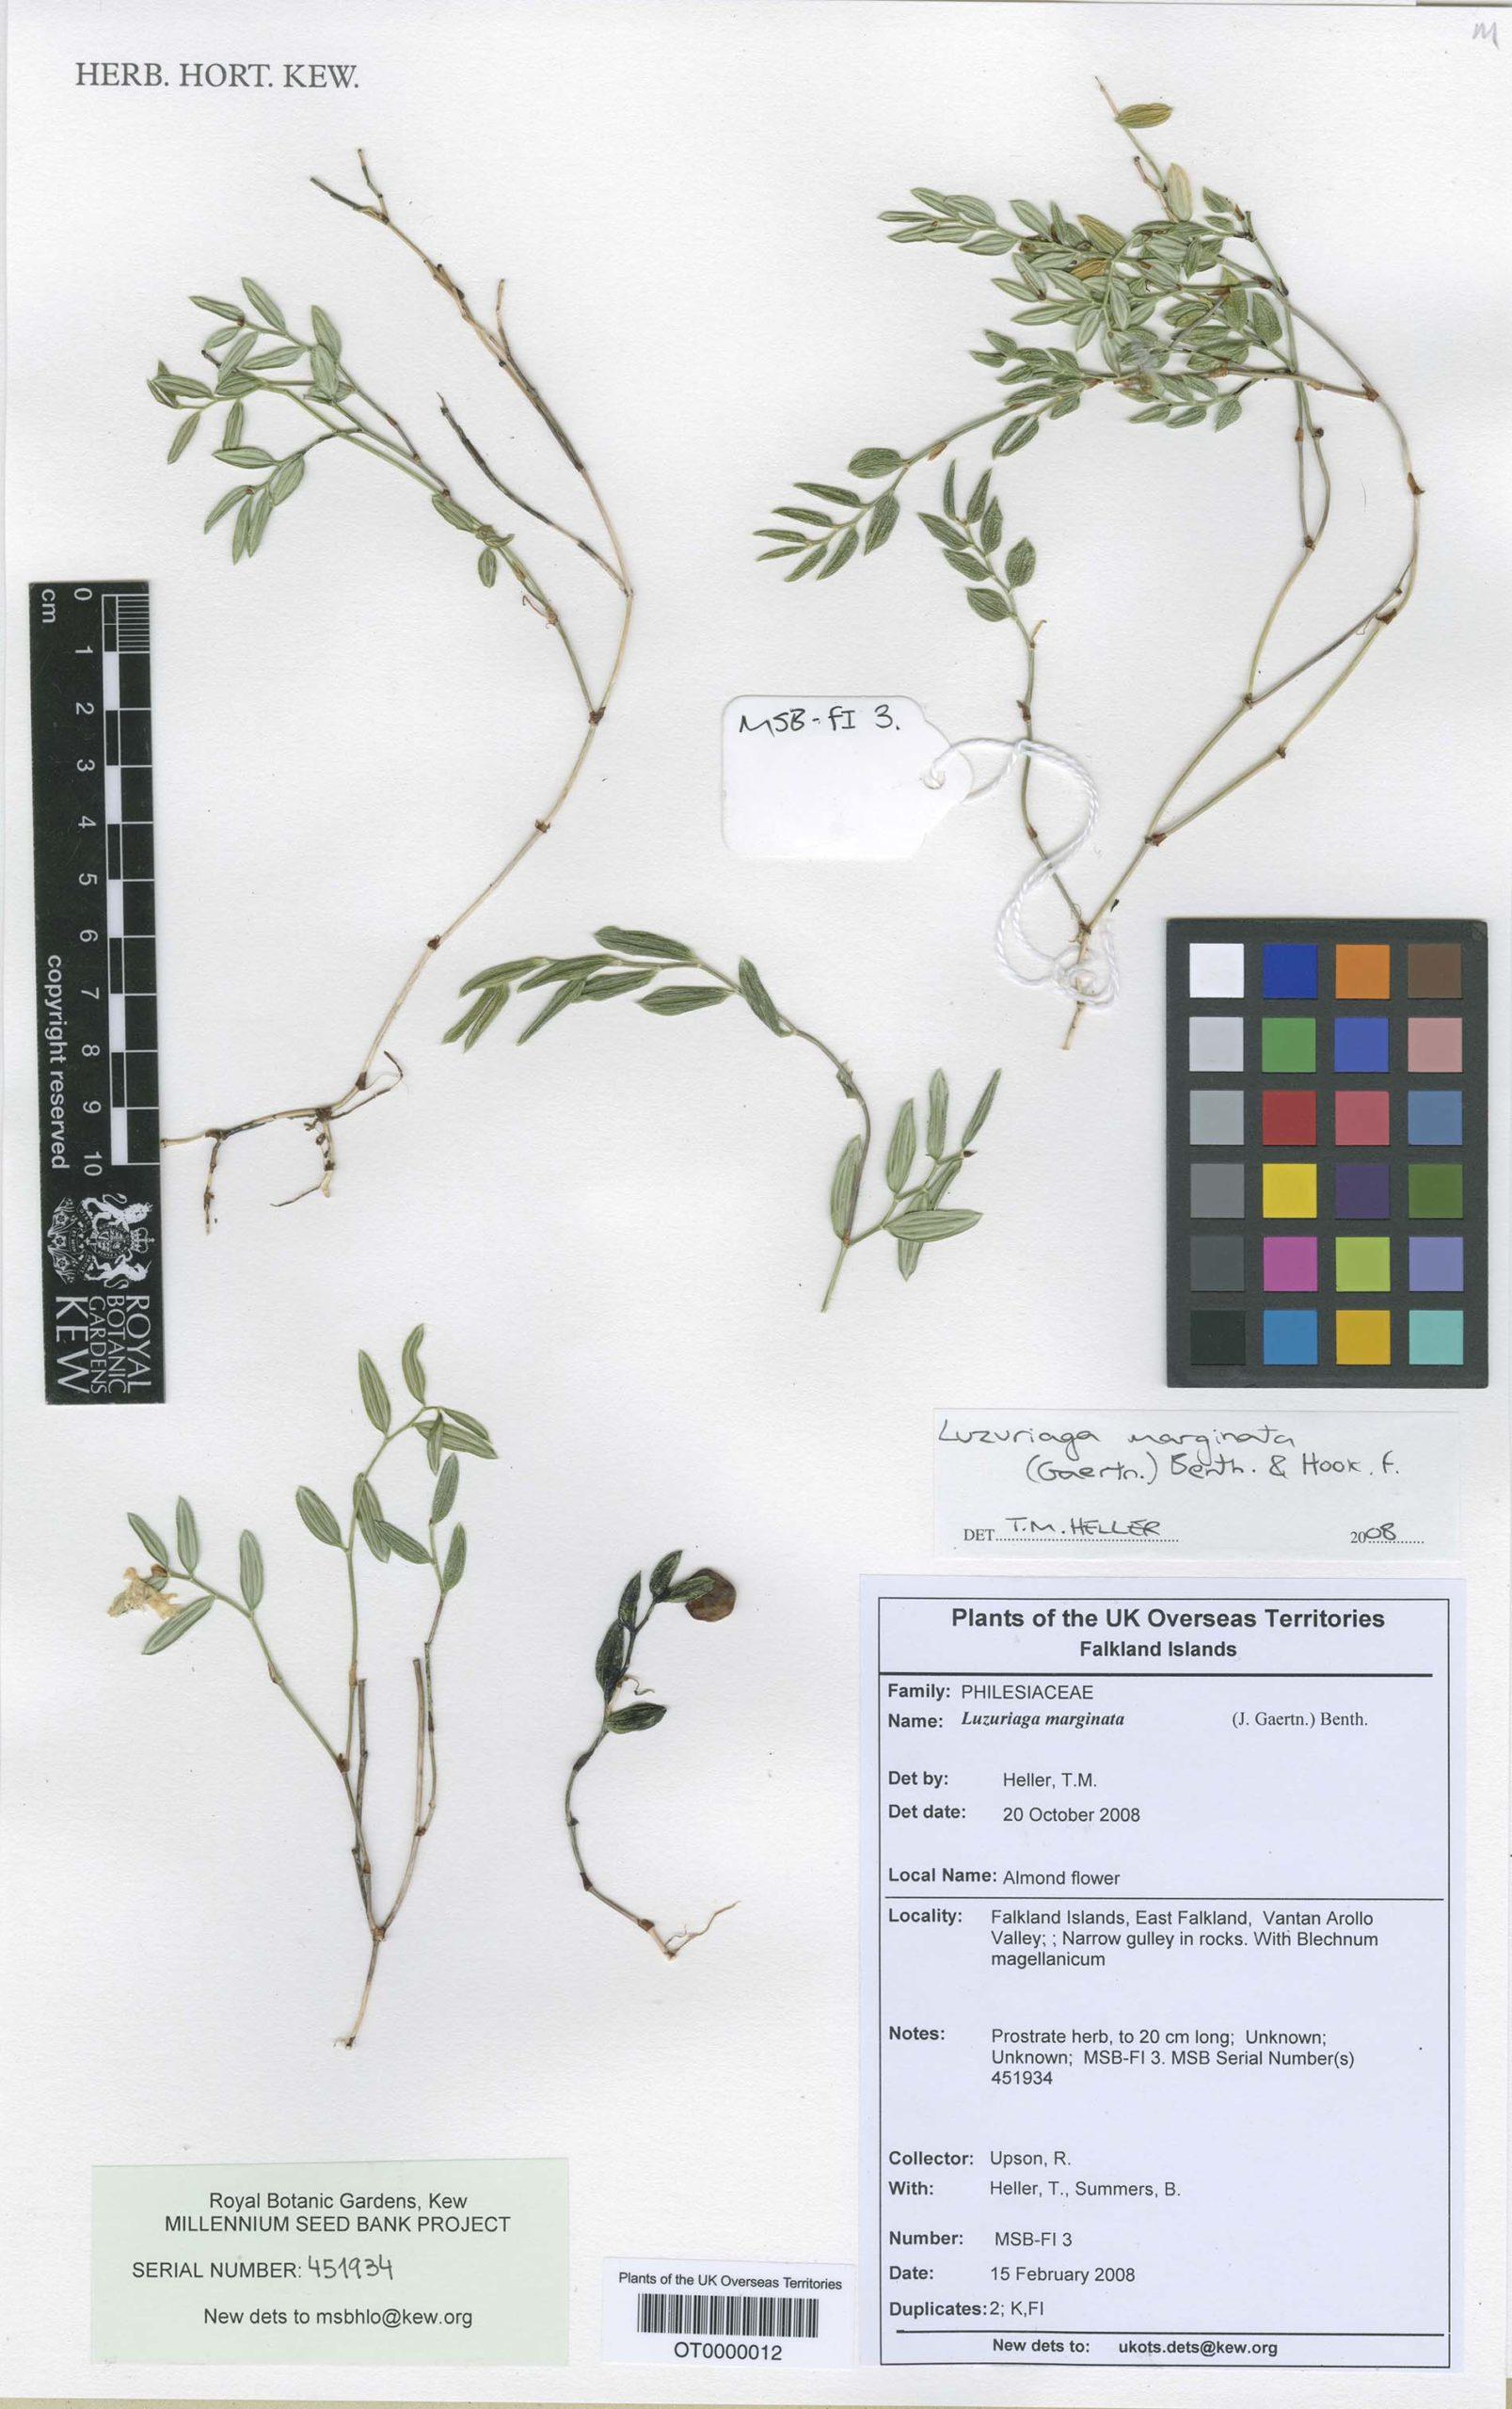 Luzuriaga marginata (Gaertn.) Benth. & Hook.f.